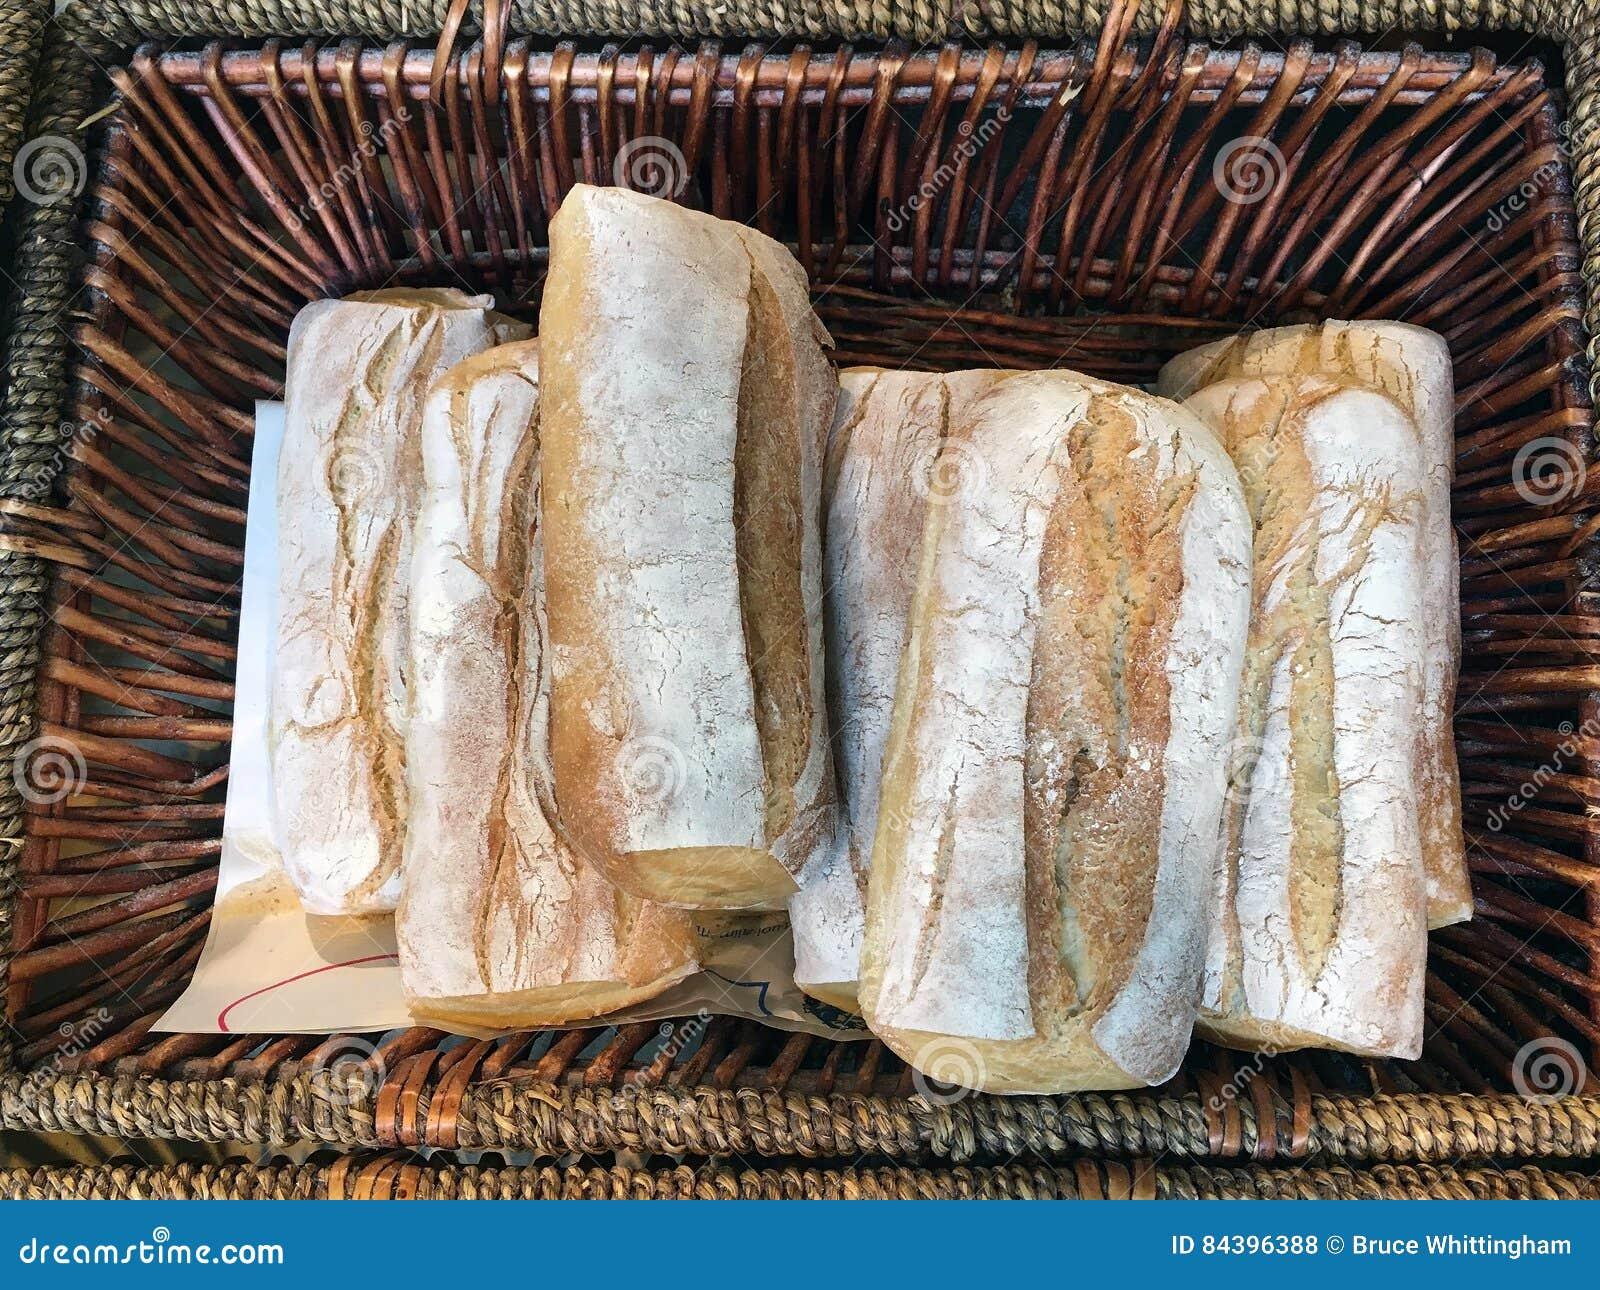 Artisan Bread Loaves